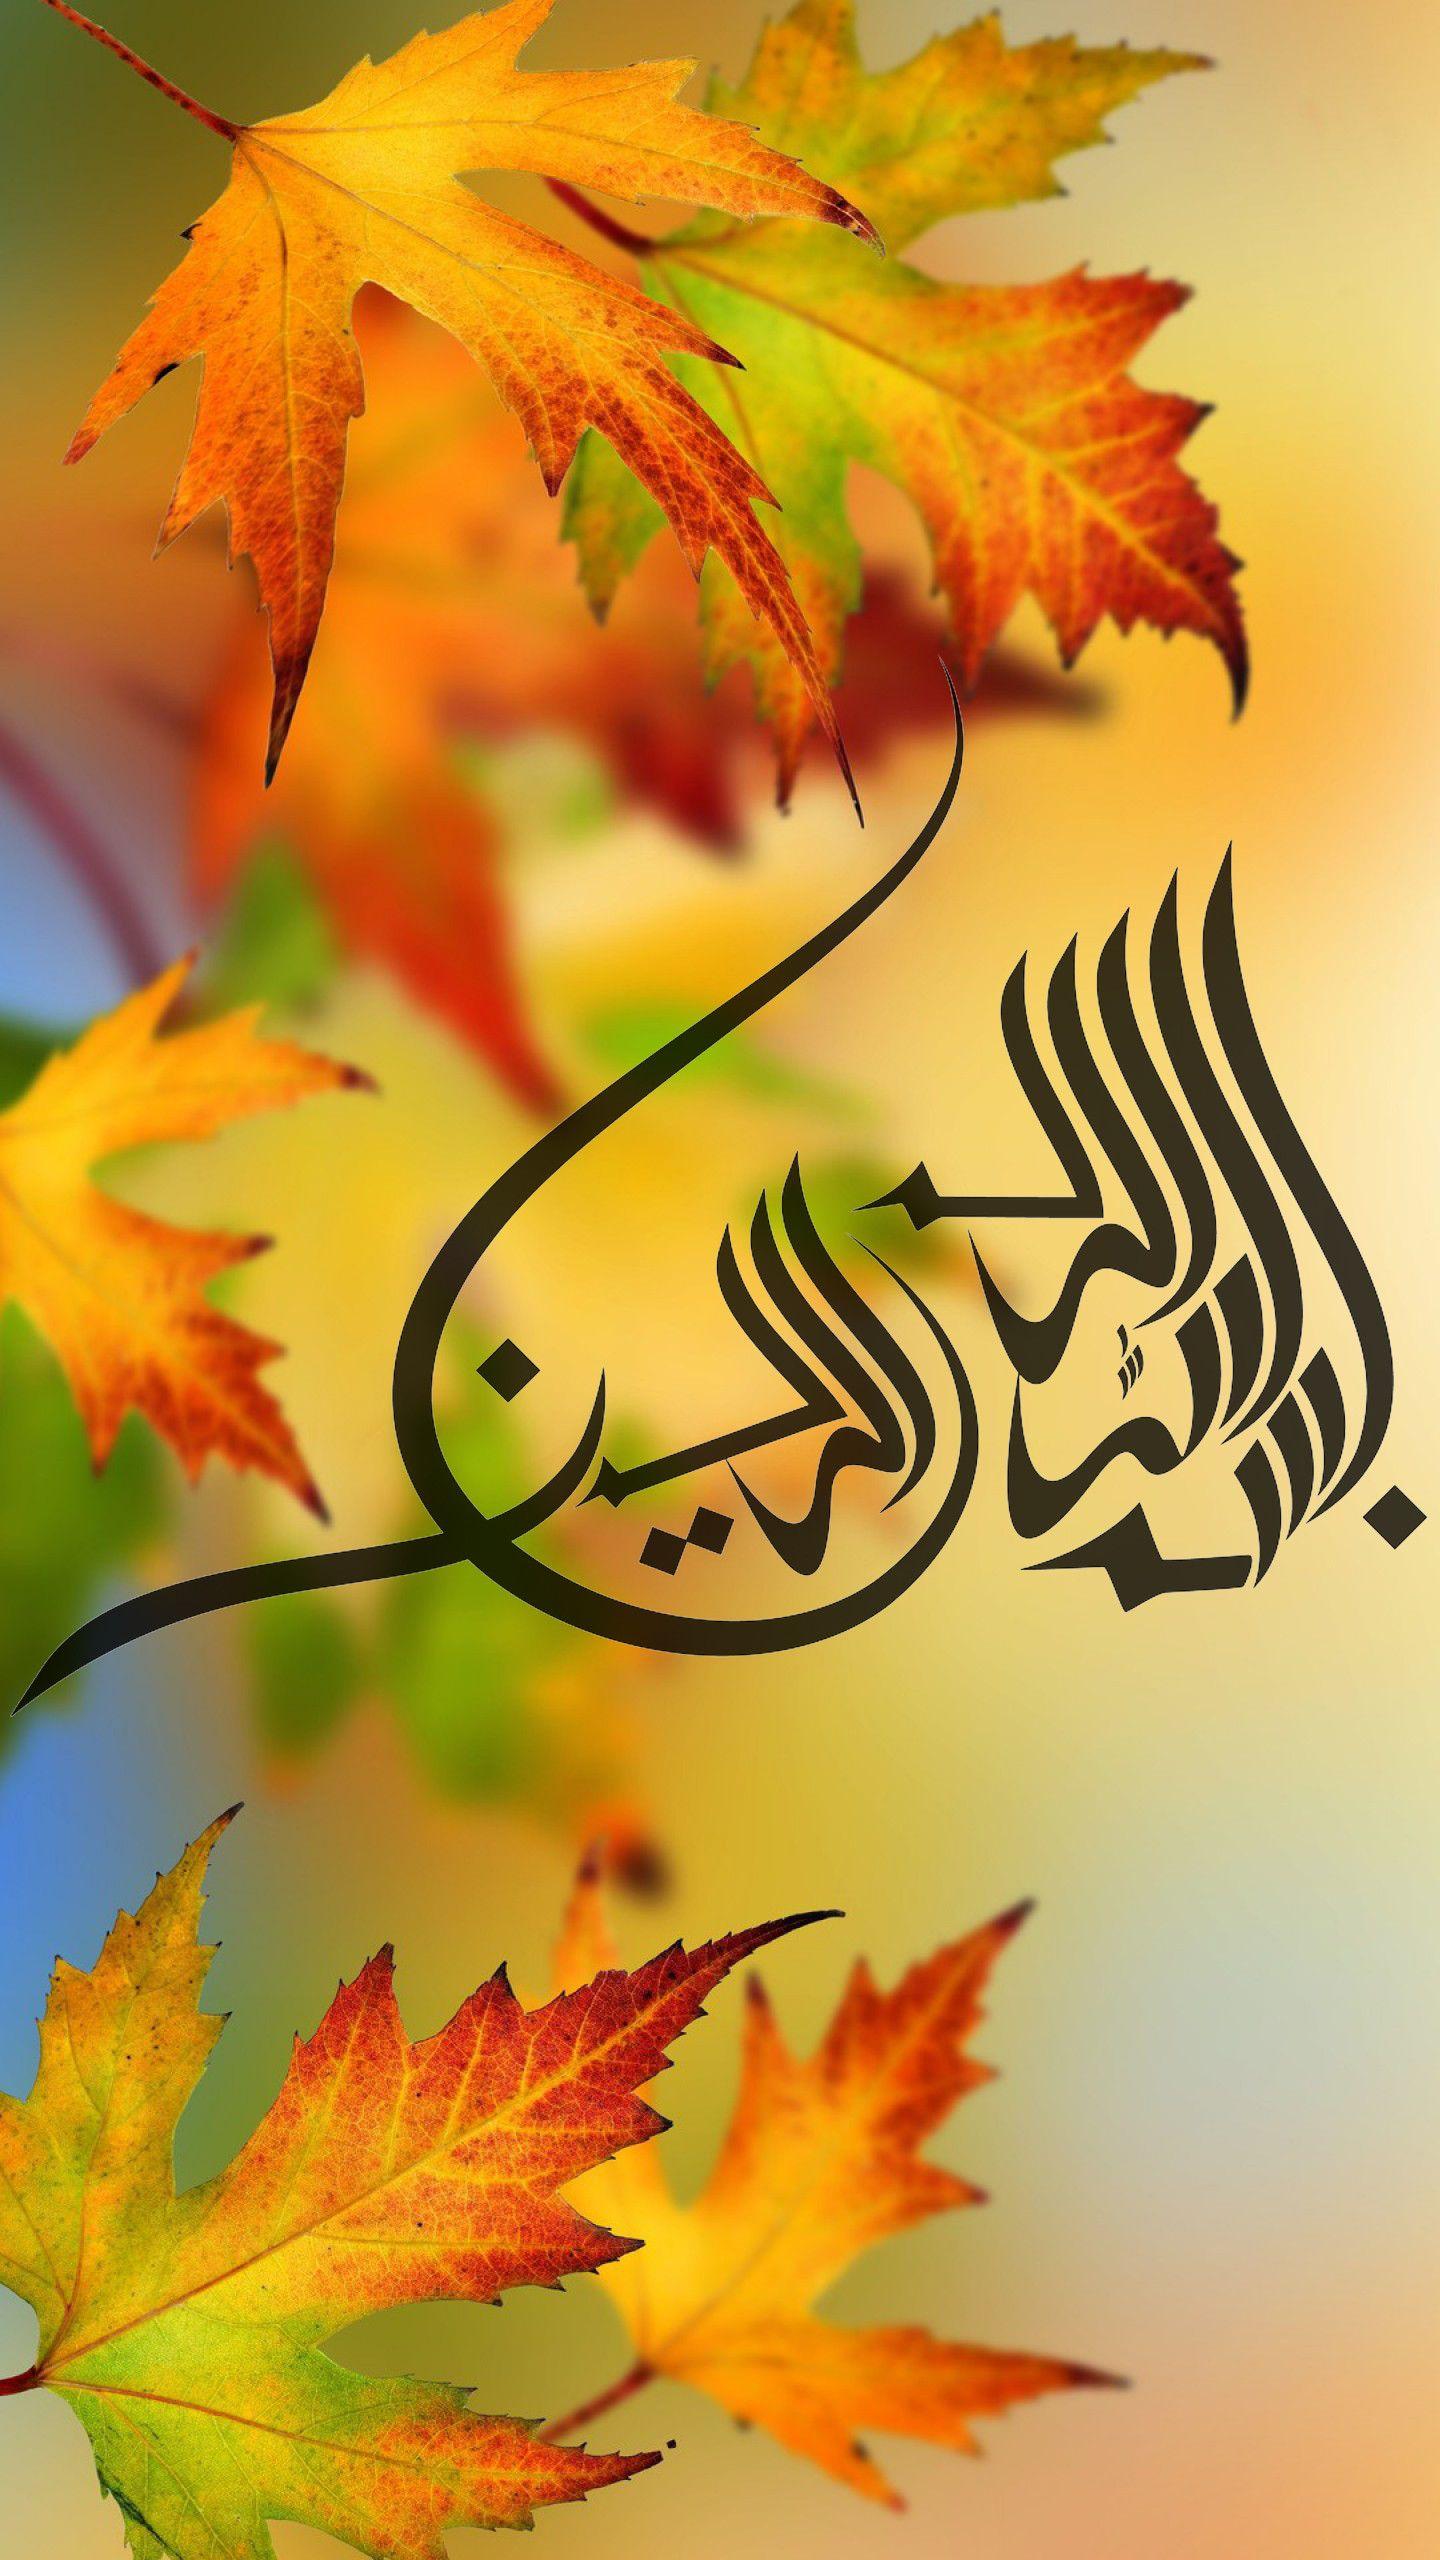 Islamic Wallpapers Hd 2018 51 Images Islamic Wallpaper Hd Islamic Wallpaper Iphone Islamic Wallpaper